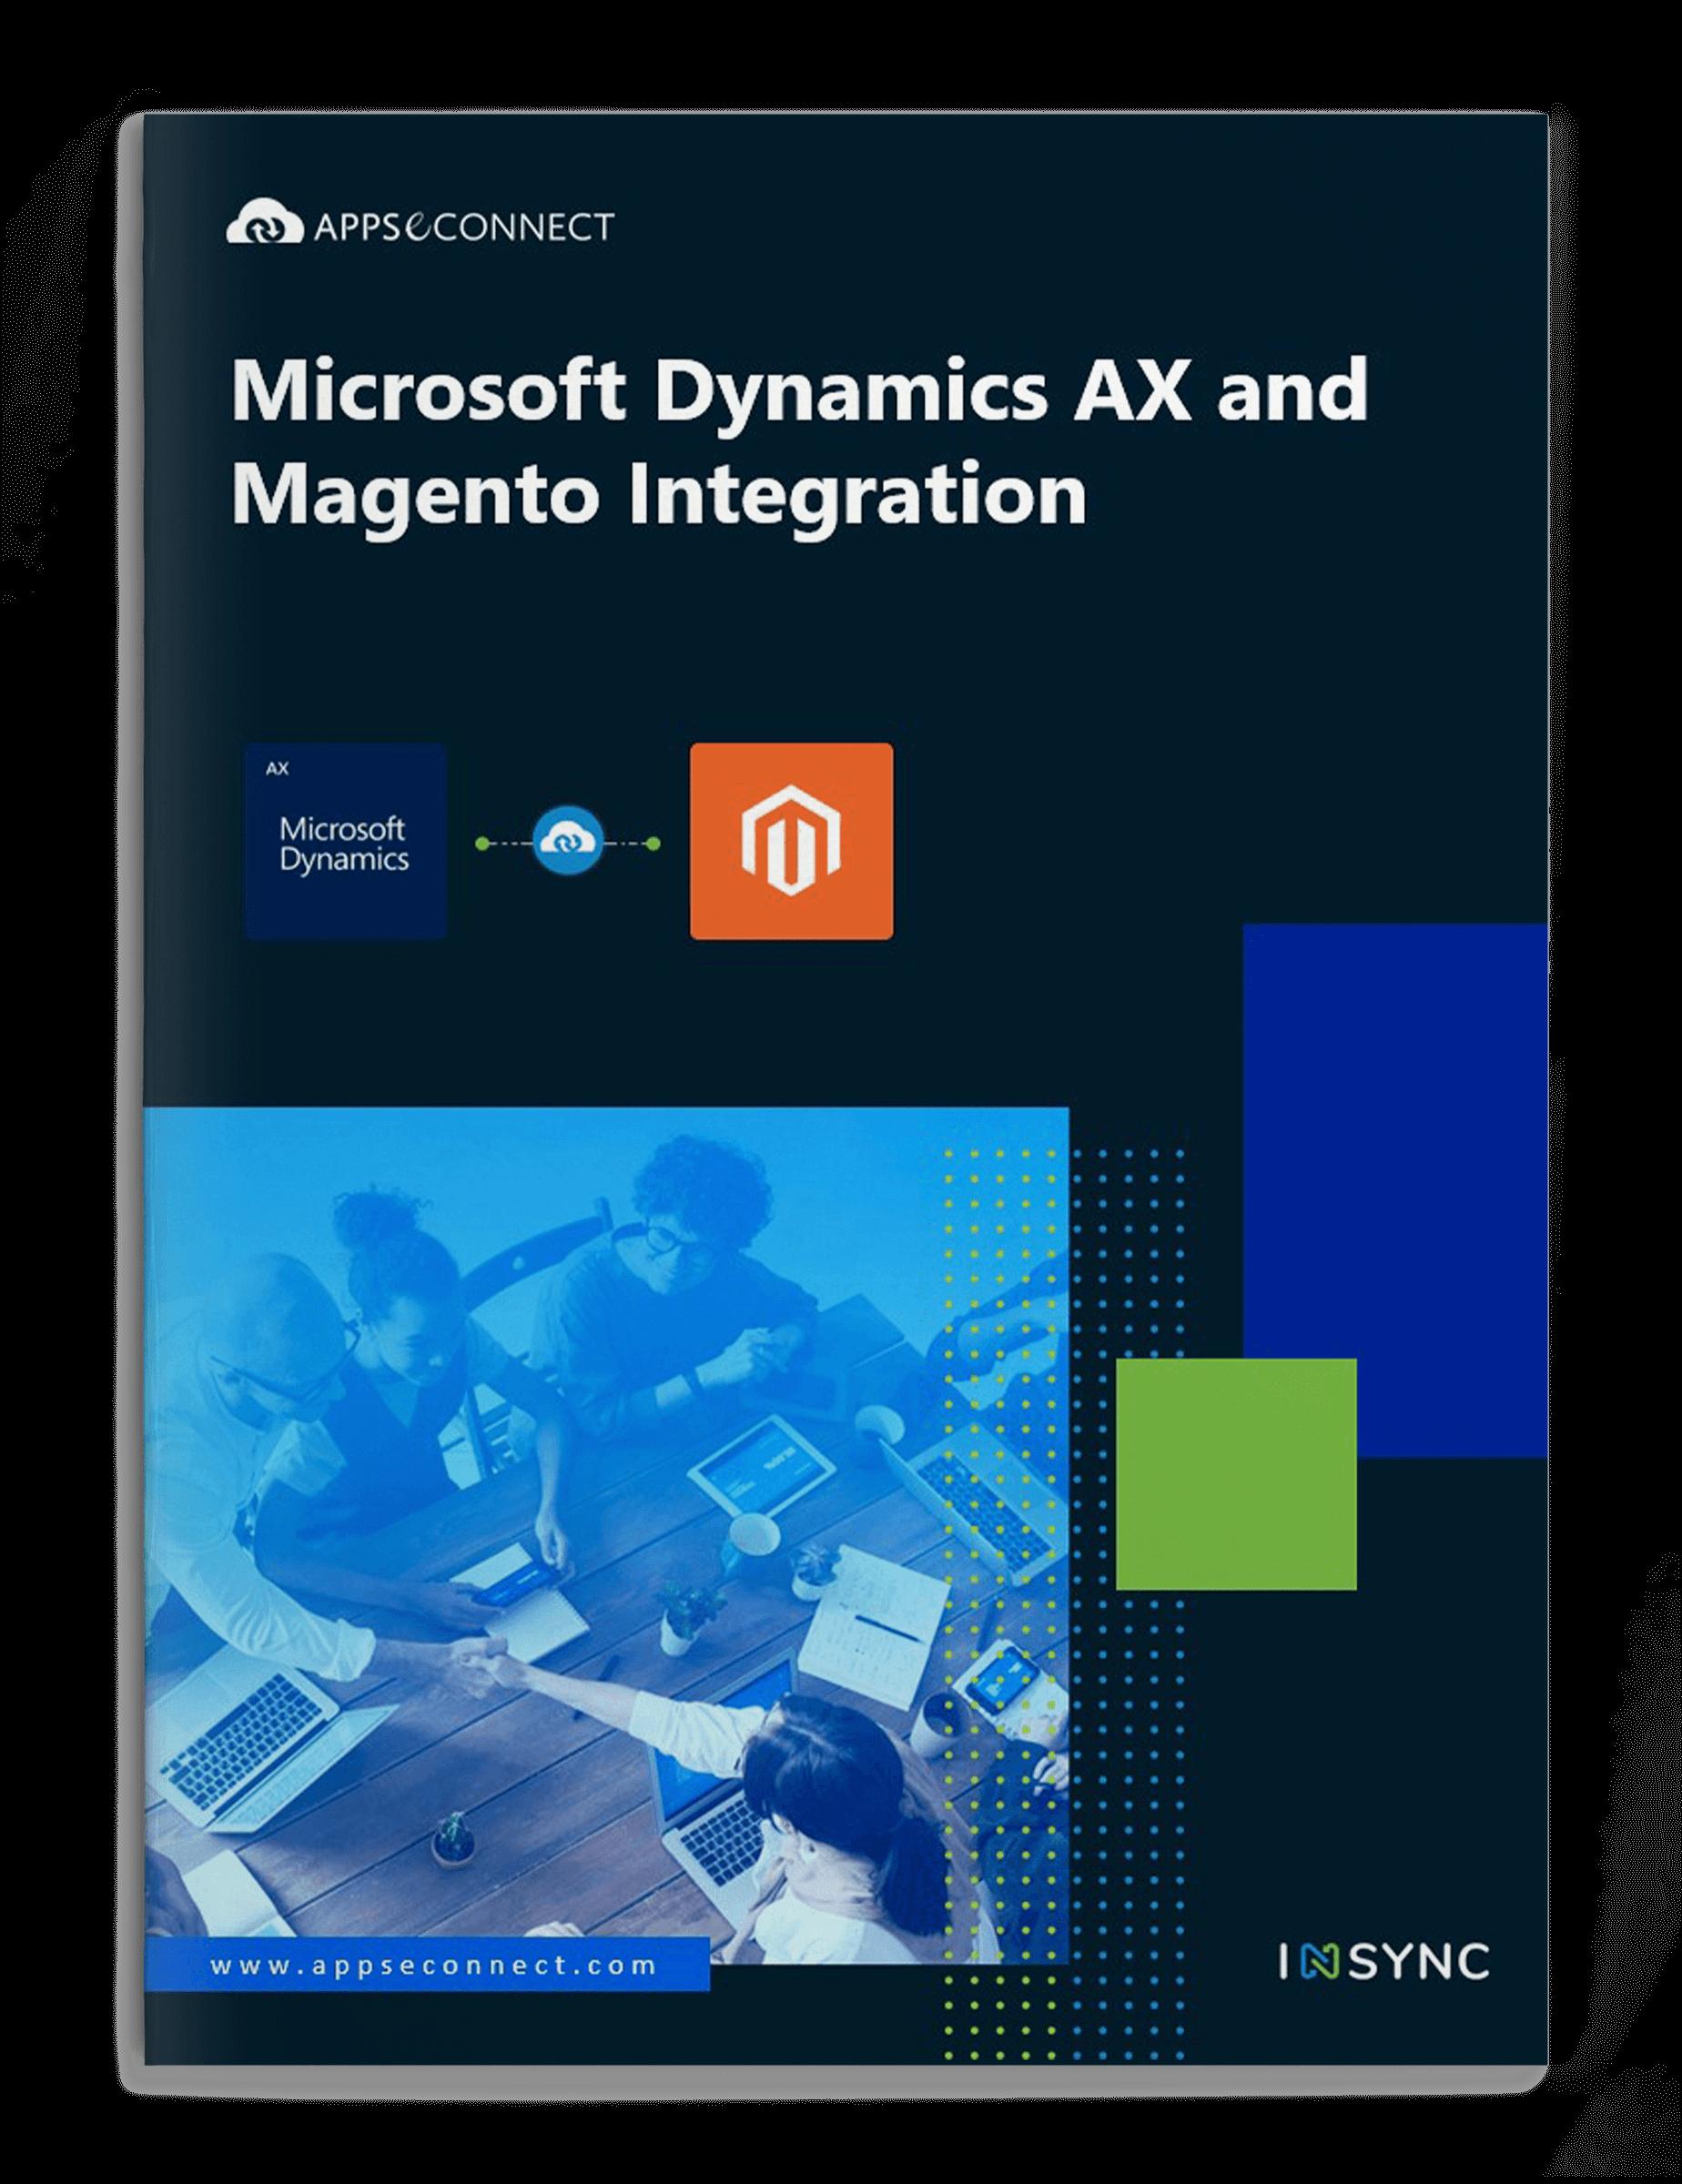 microsoft-dynamics-AX-one-magento-integration-brochure-cover